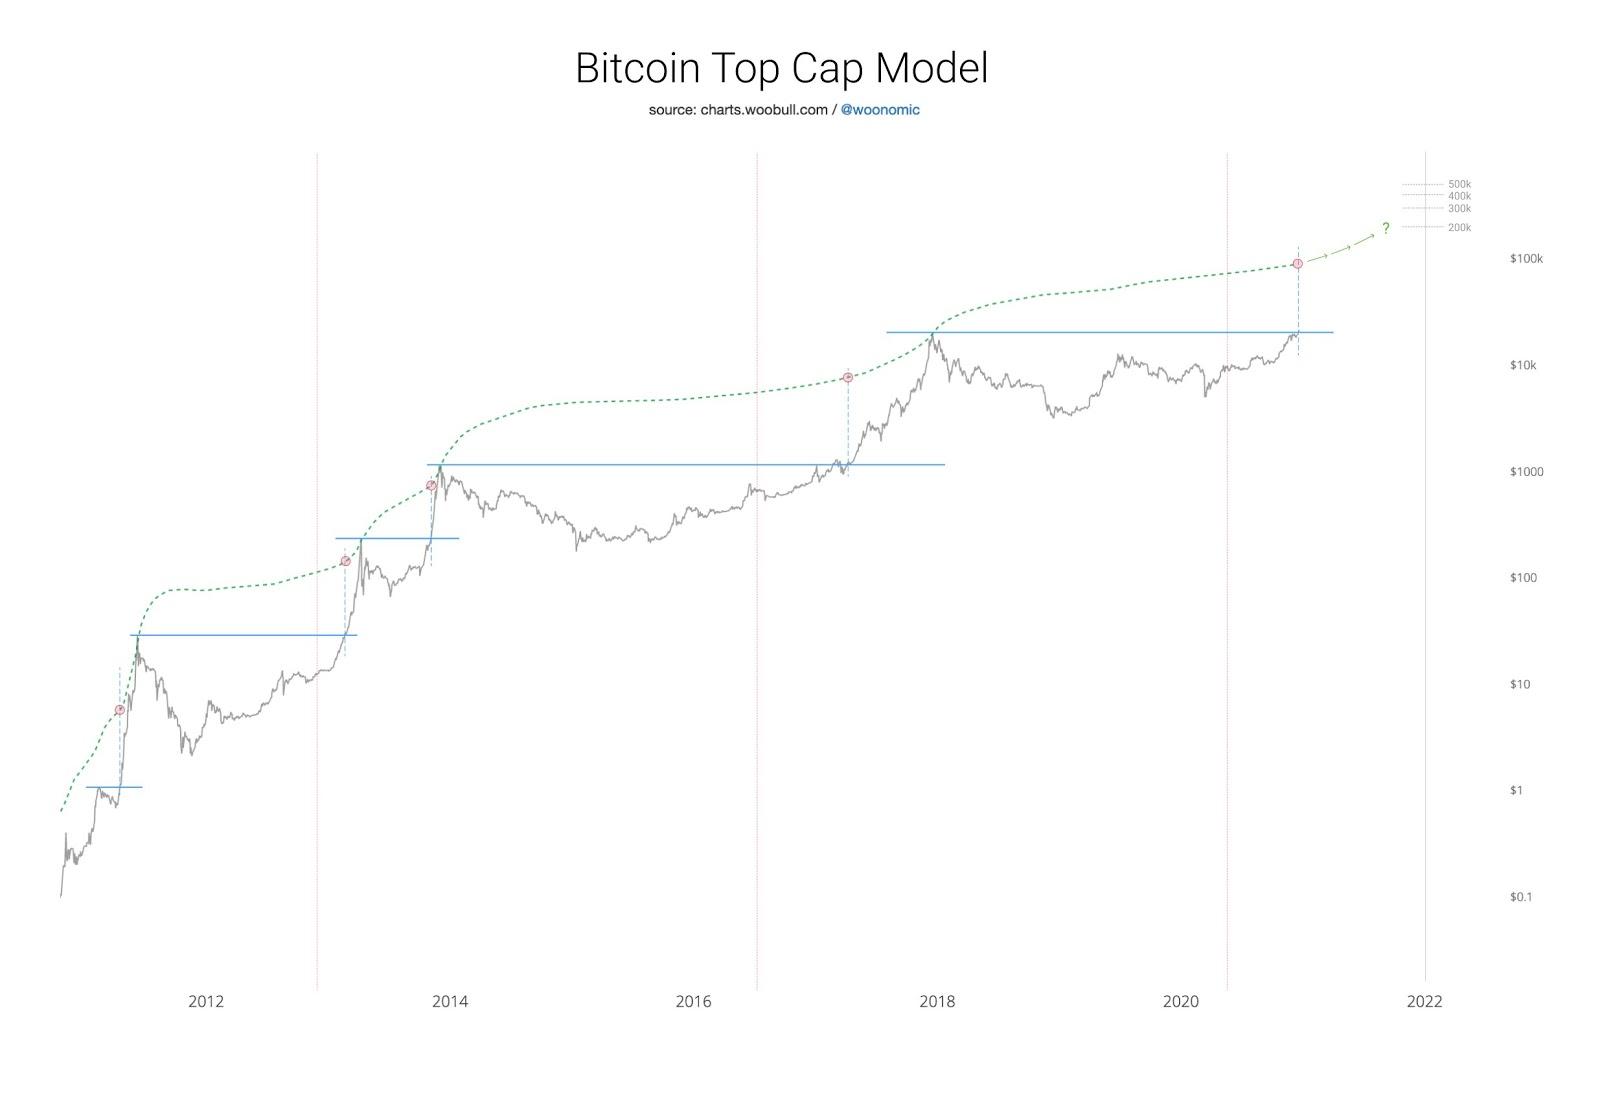 График ВТС по модели Вилли Ву